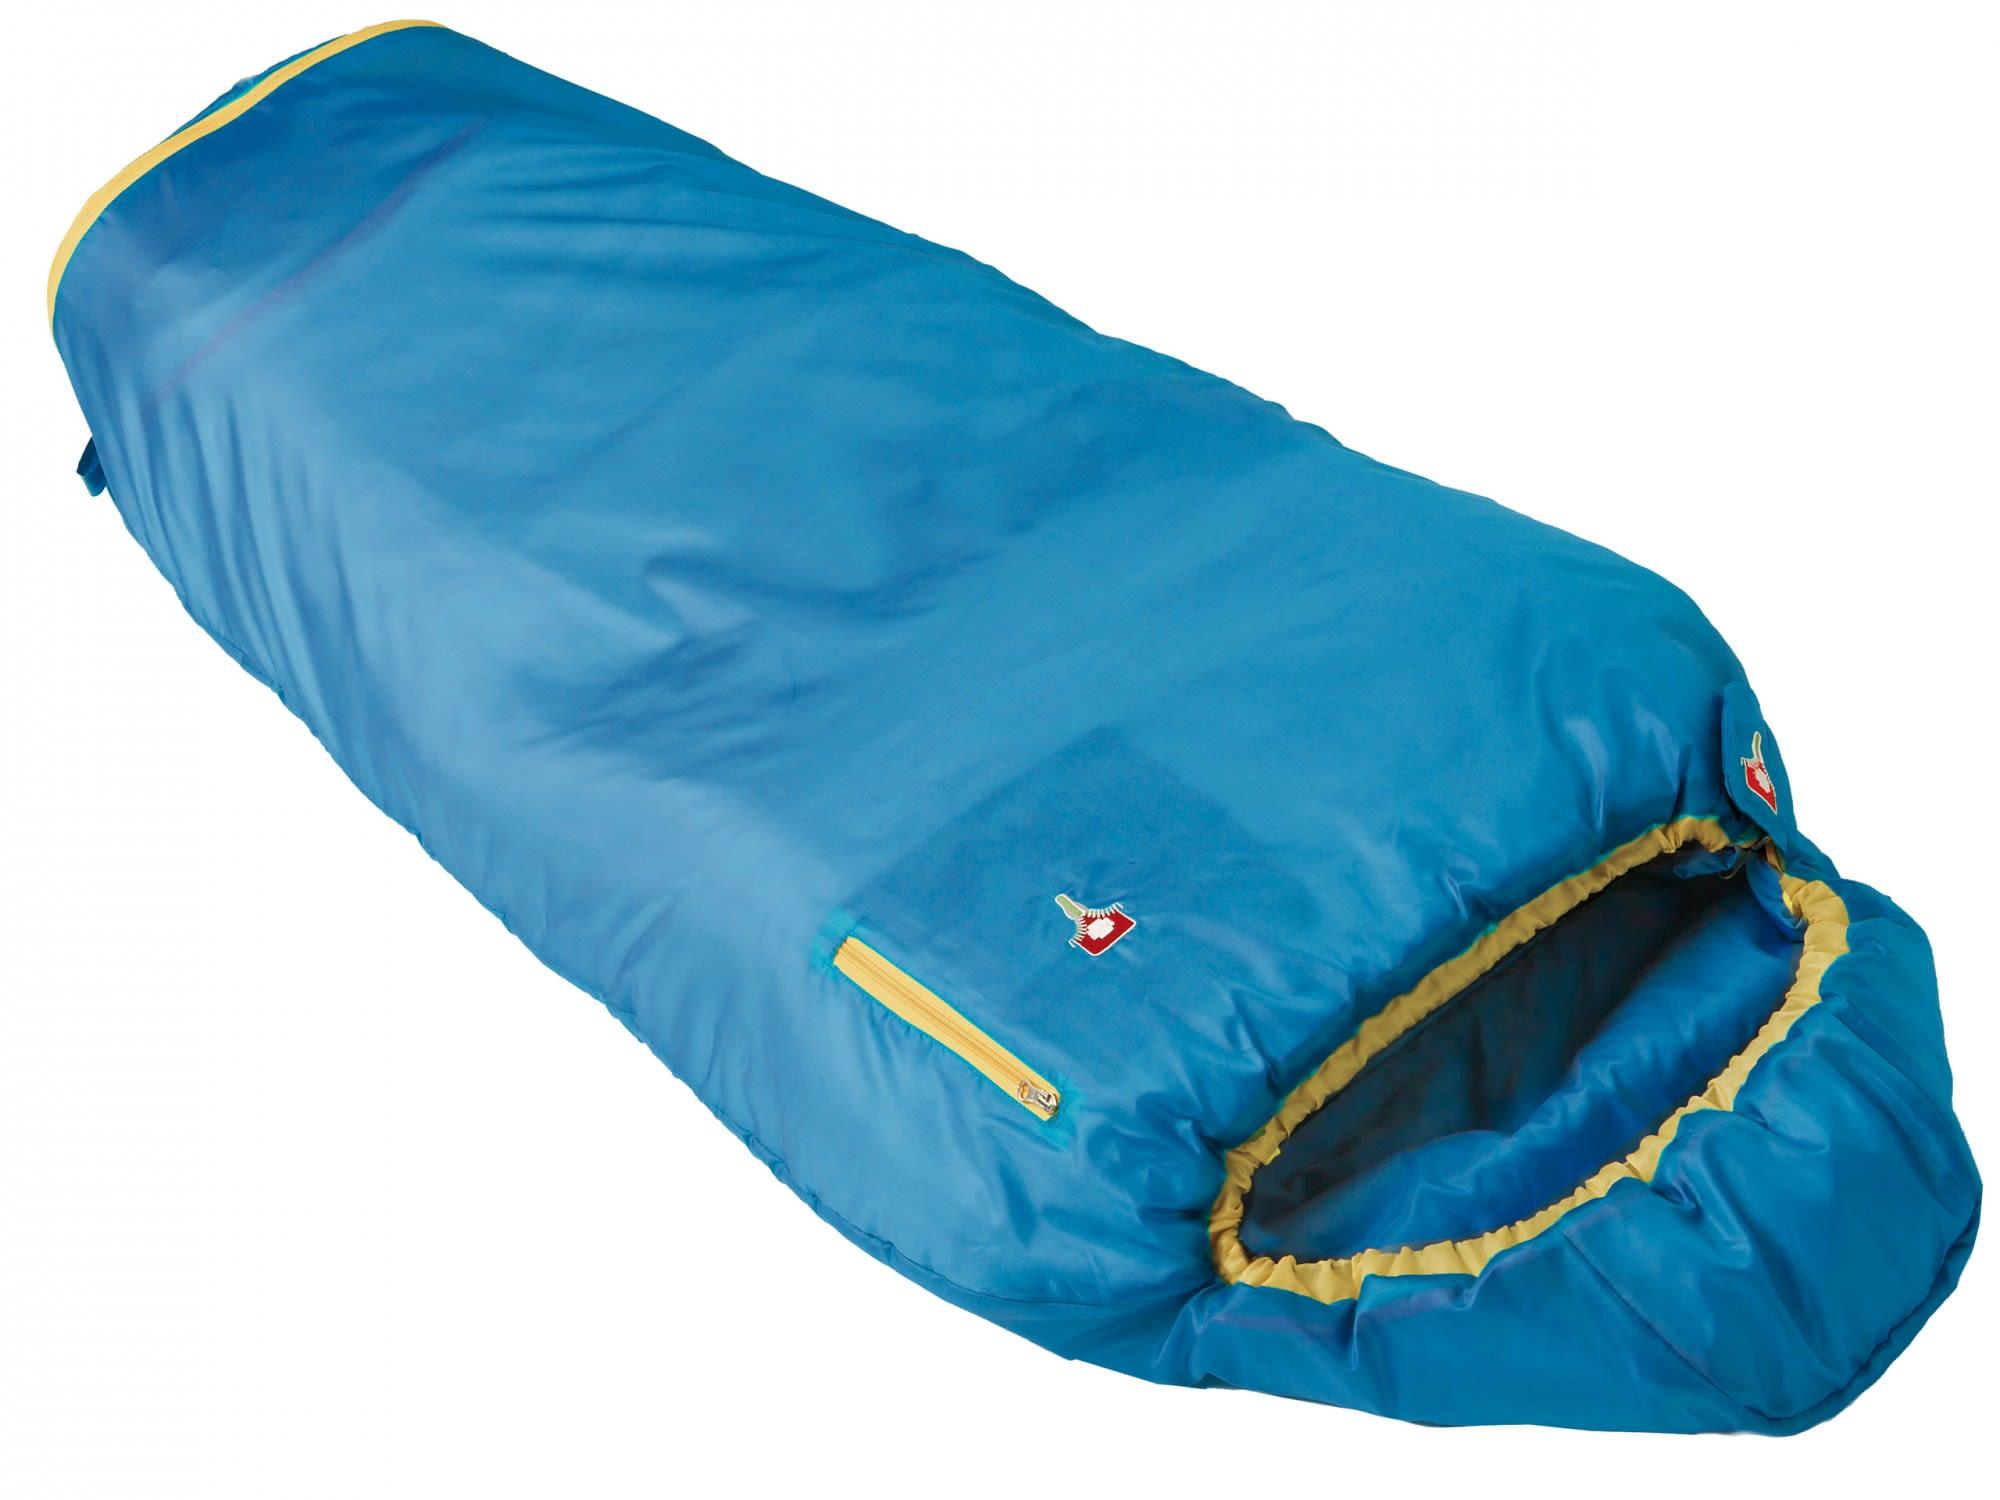 Grüezi Bag Kids Grow Colorful Blau, 180 cm RV rechts -Farbe Water, 180 cm RV re